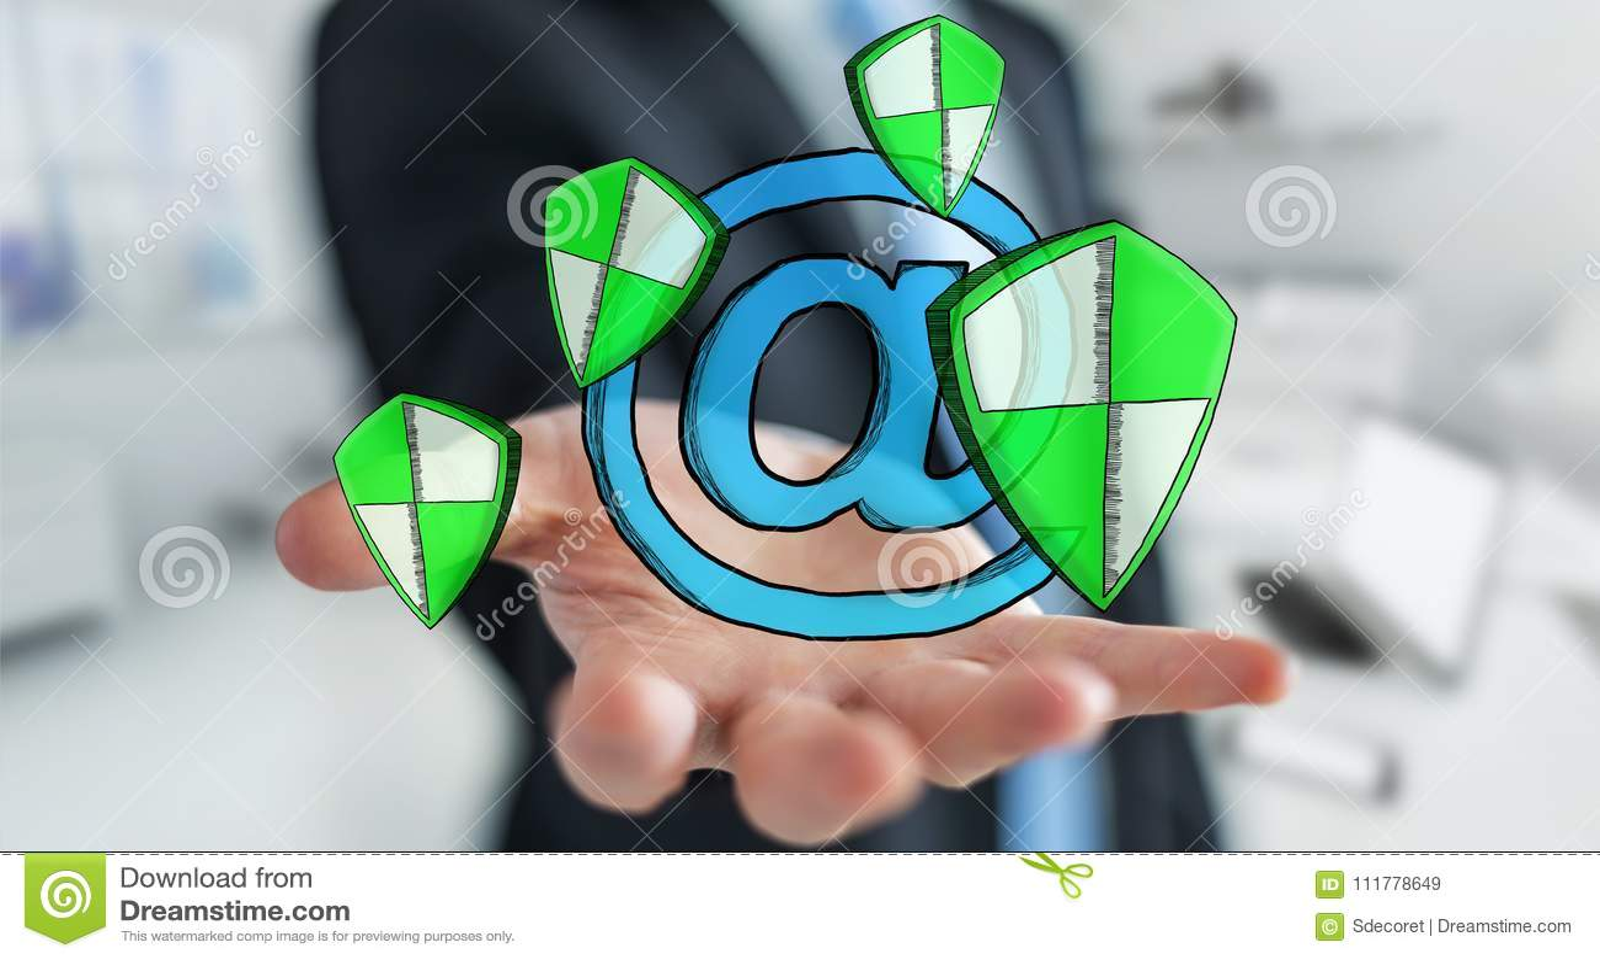 Businessman holding a hand-drawn antivirus system